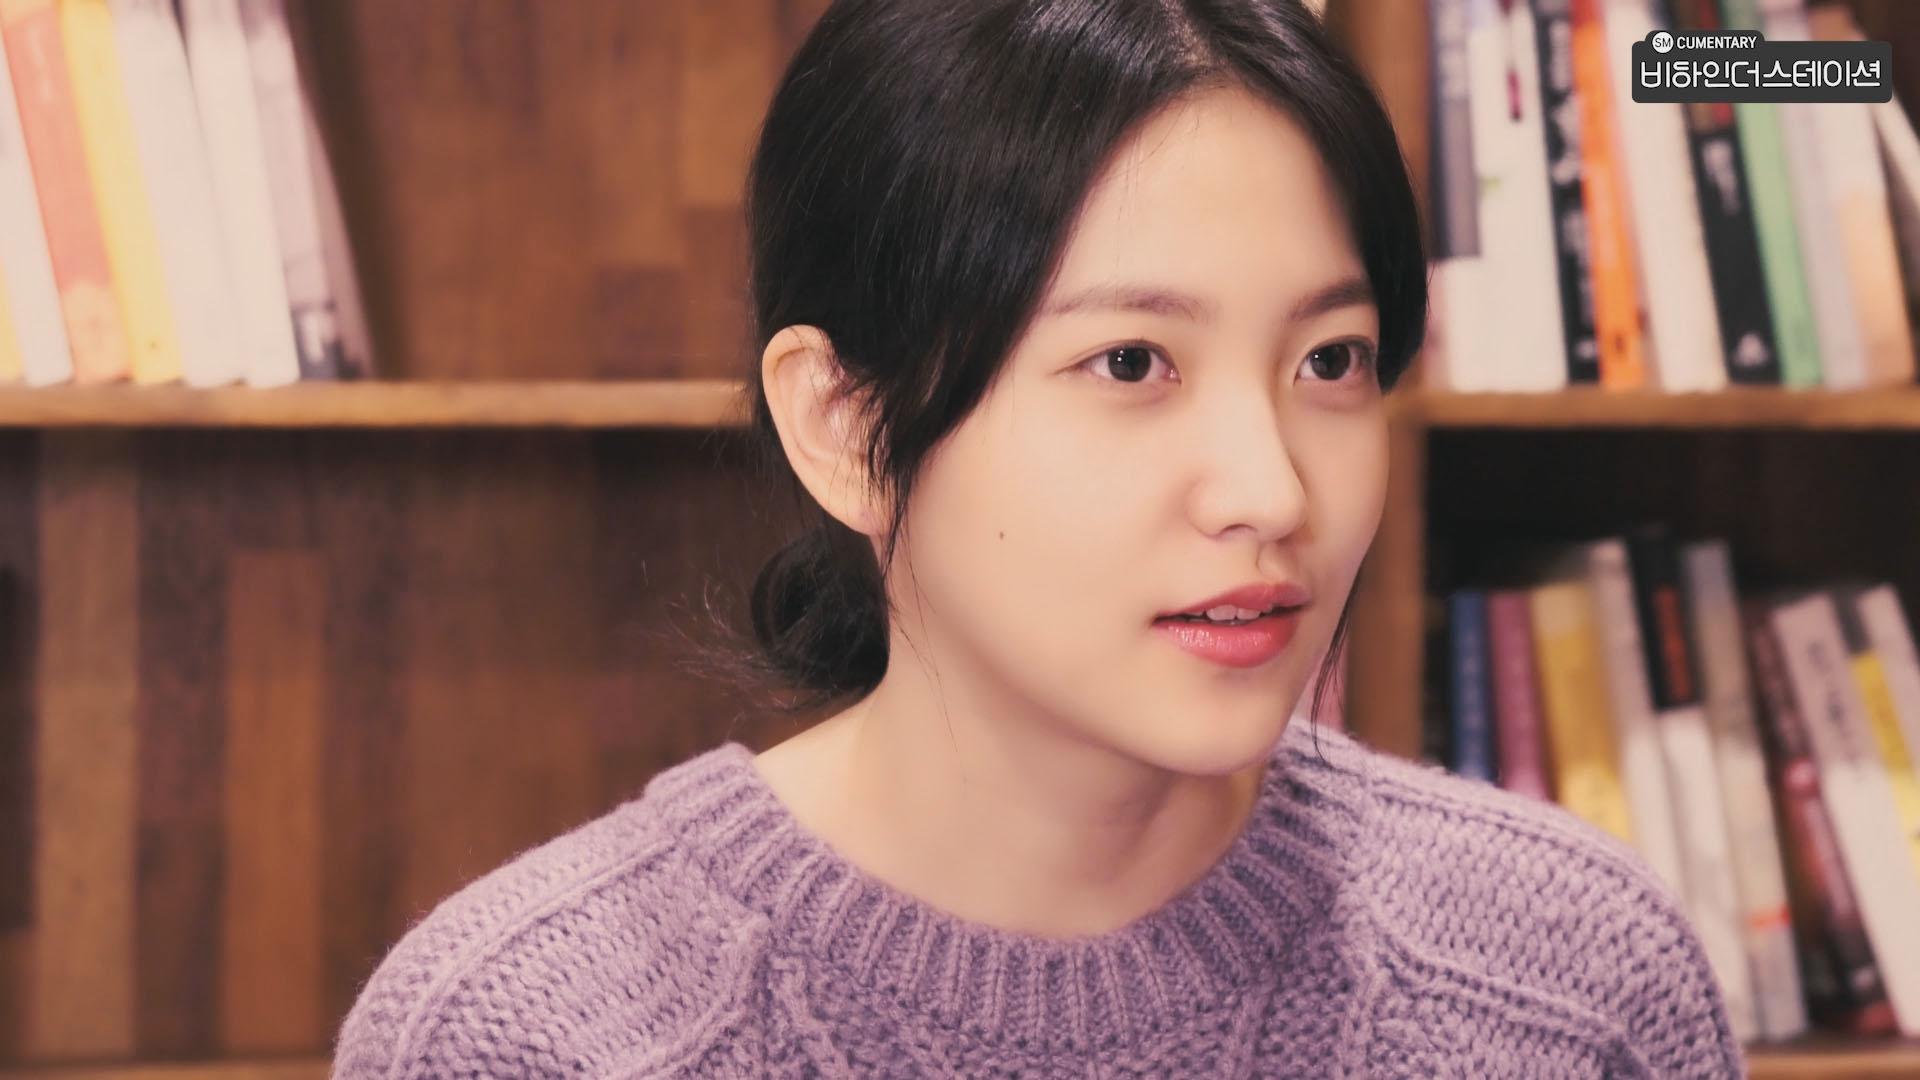 [STATION 3] YERI 예리 '스물에게 (Dear Diary)' 비하인더스테이션 #1 예리에게 하는 스무 가지 질문